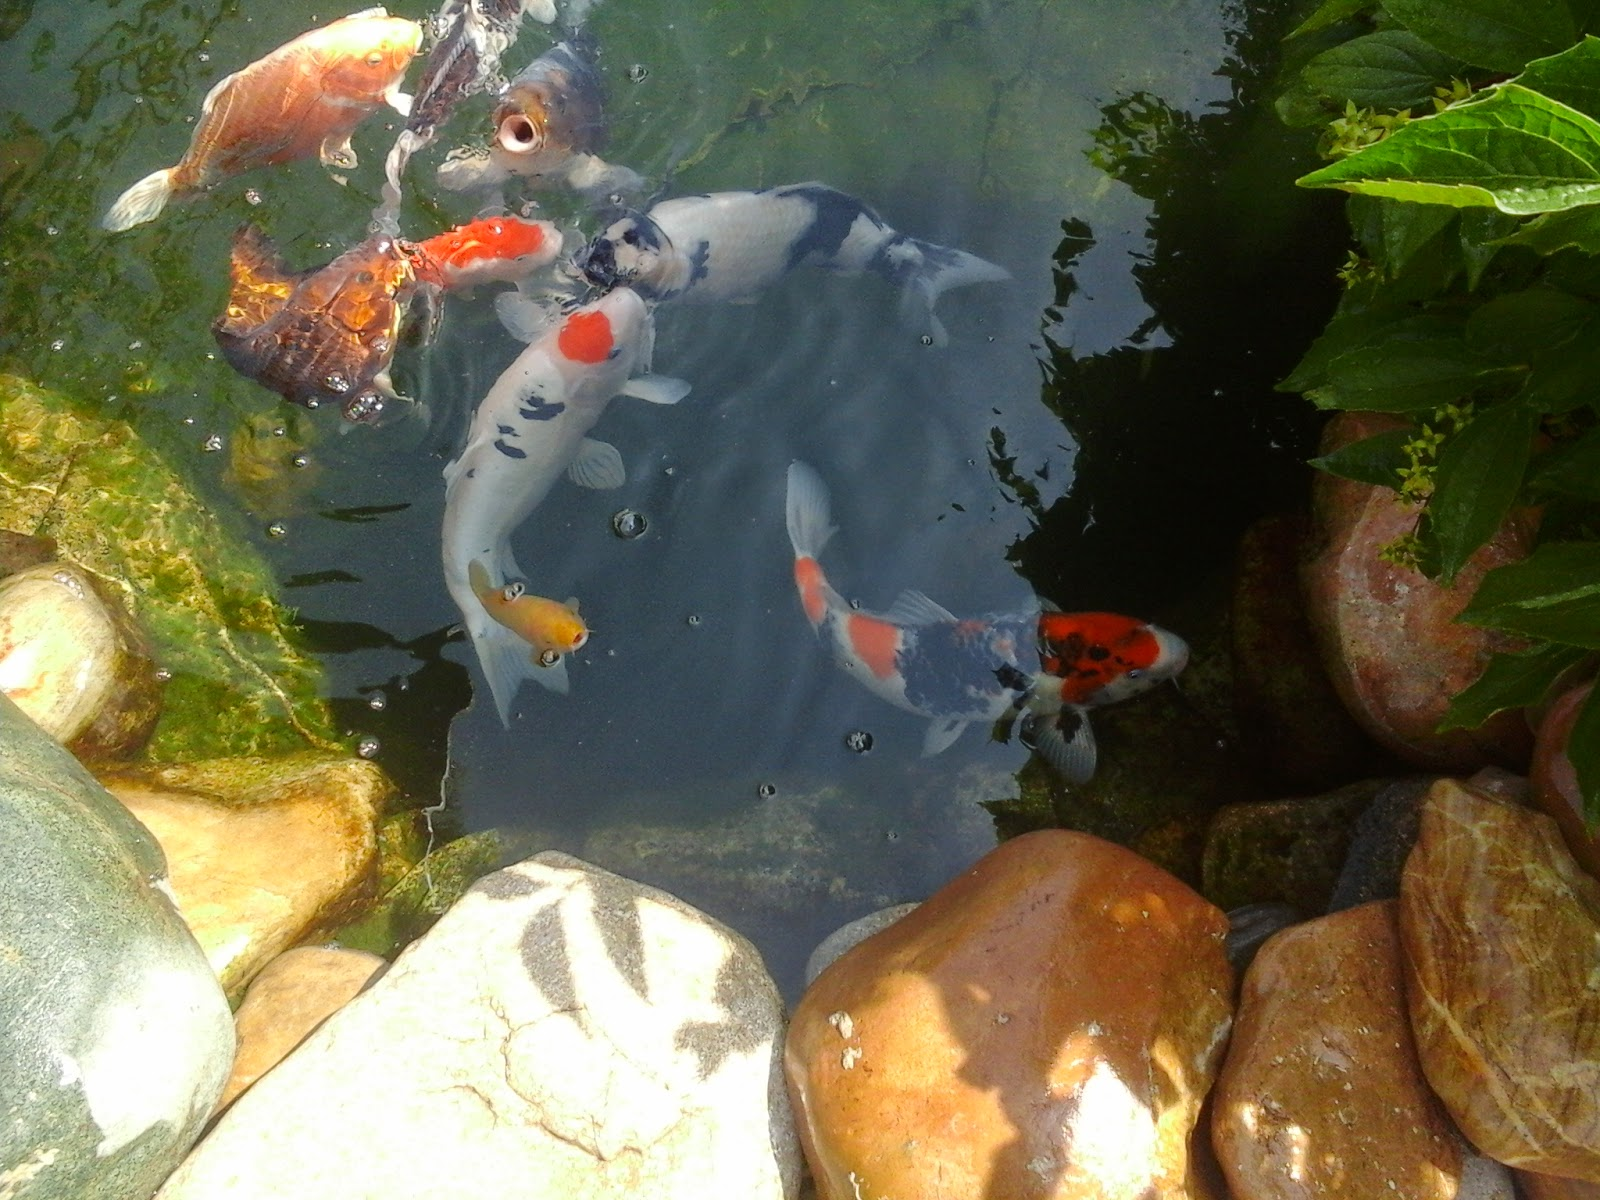 Bonsa et carpes koi mon bassin for Elever des carpes